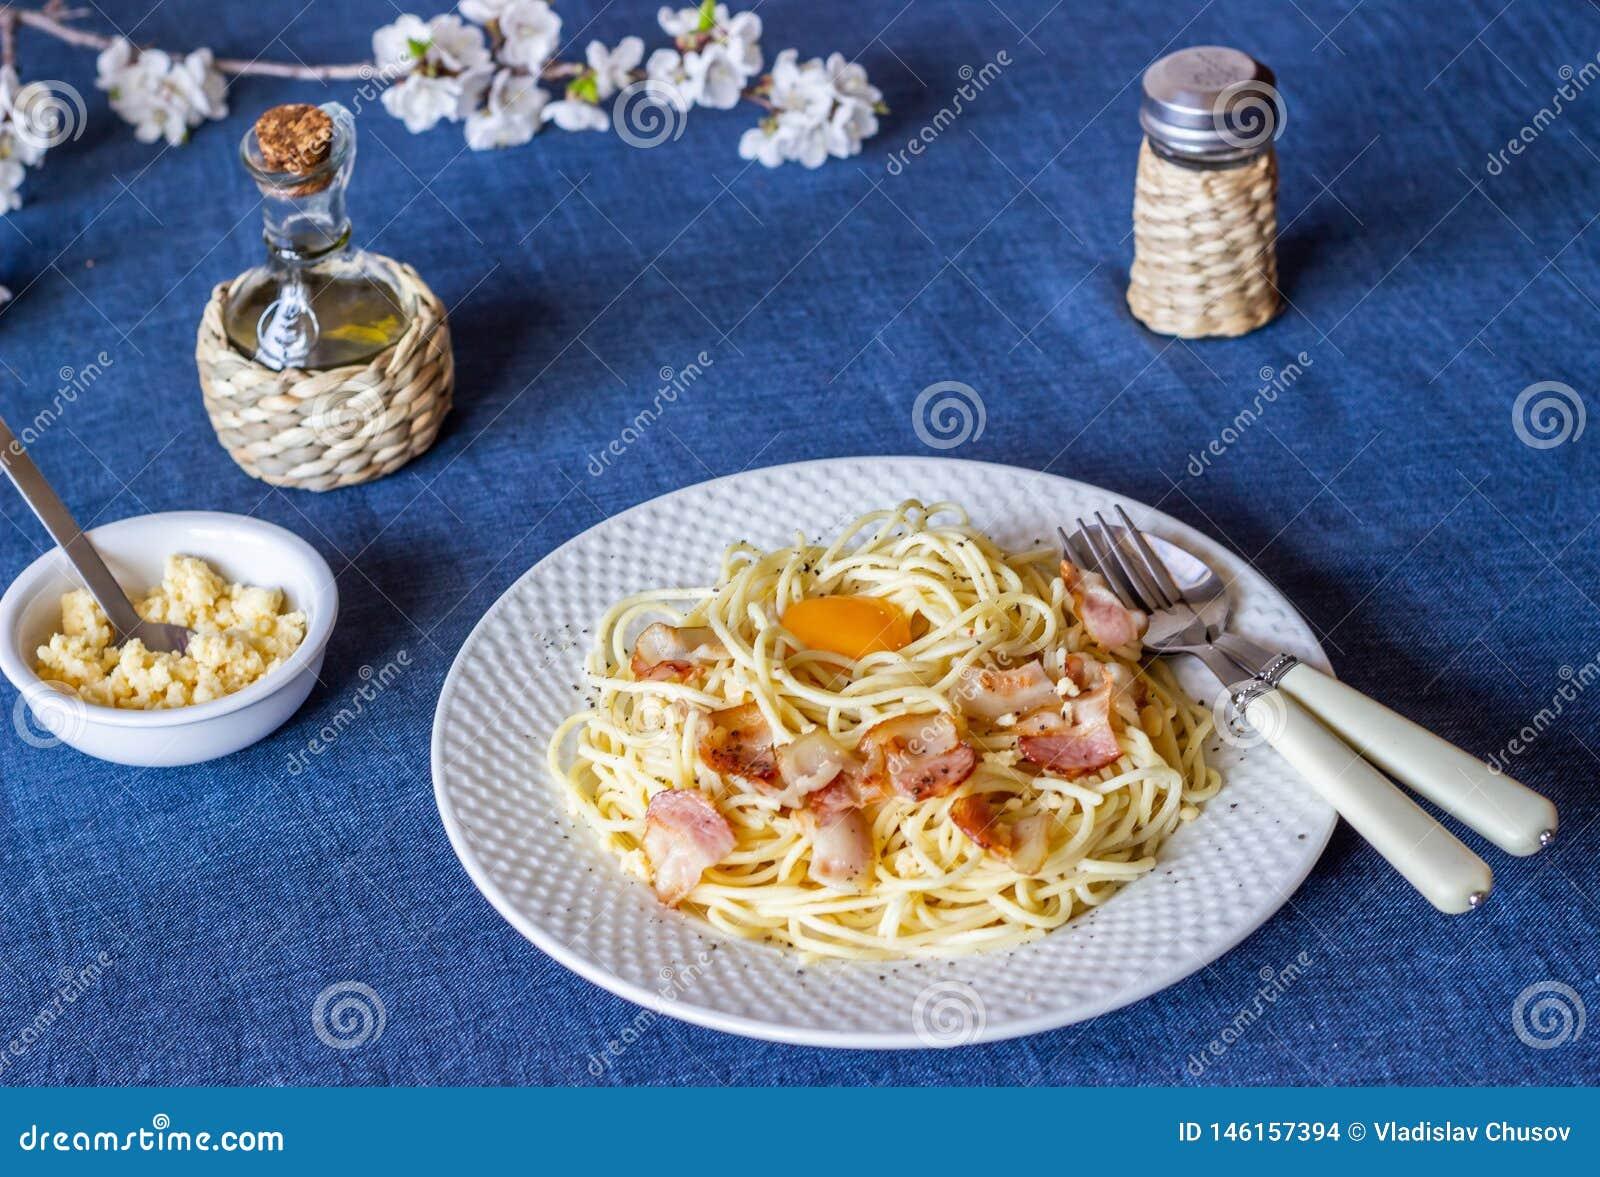 Pasta Carbonara. Flowers in the background. Italian food